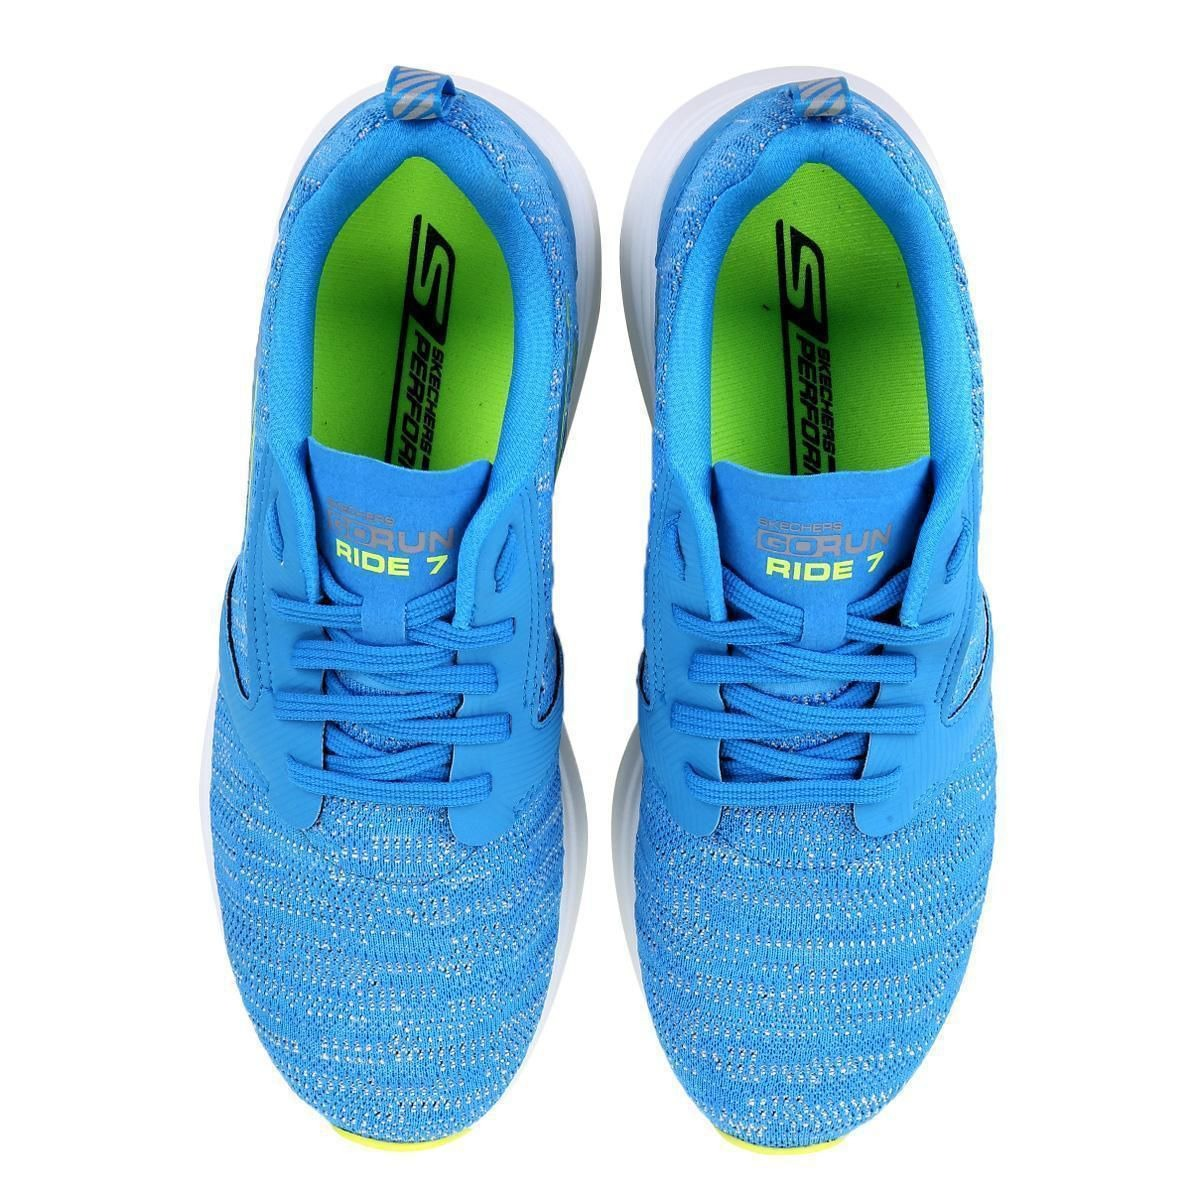 540079a5f Carregando zoom... run masculino tênis. Carregando zoom... tênis skechers  go run ride 7 masculino - azul - original